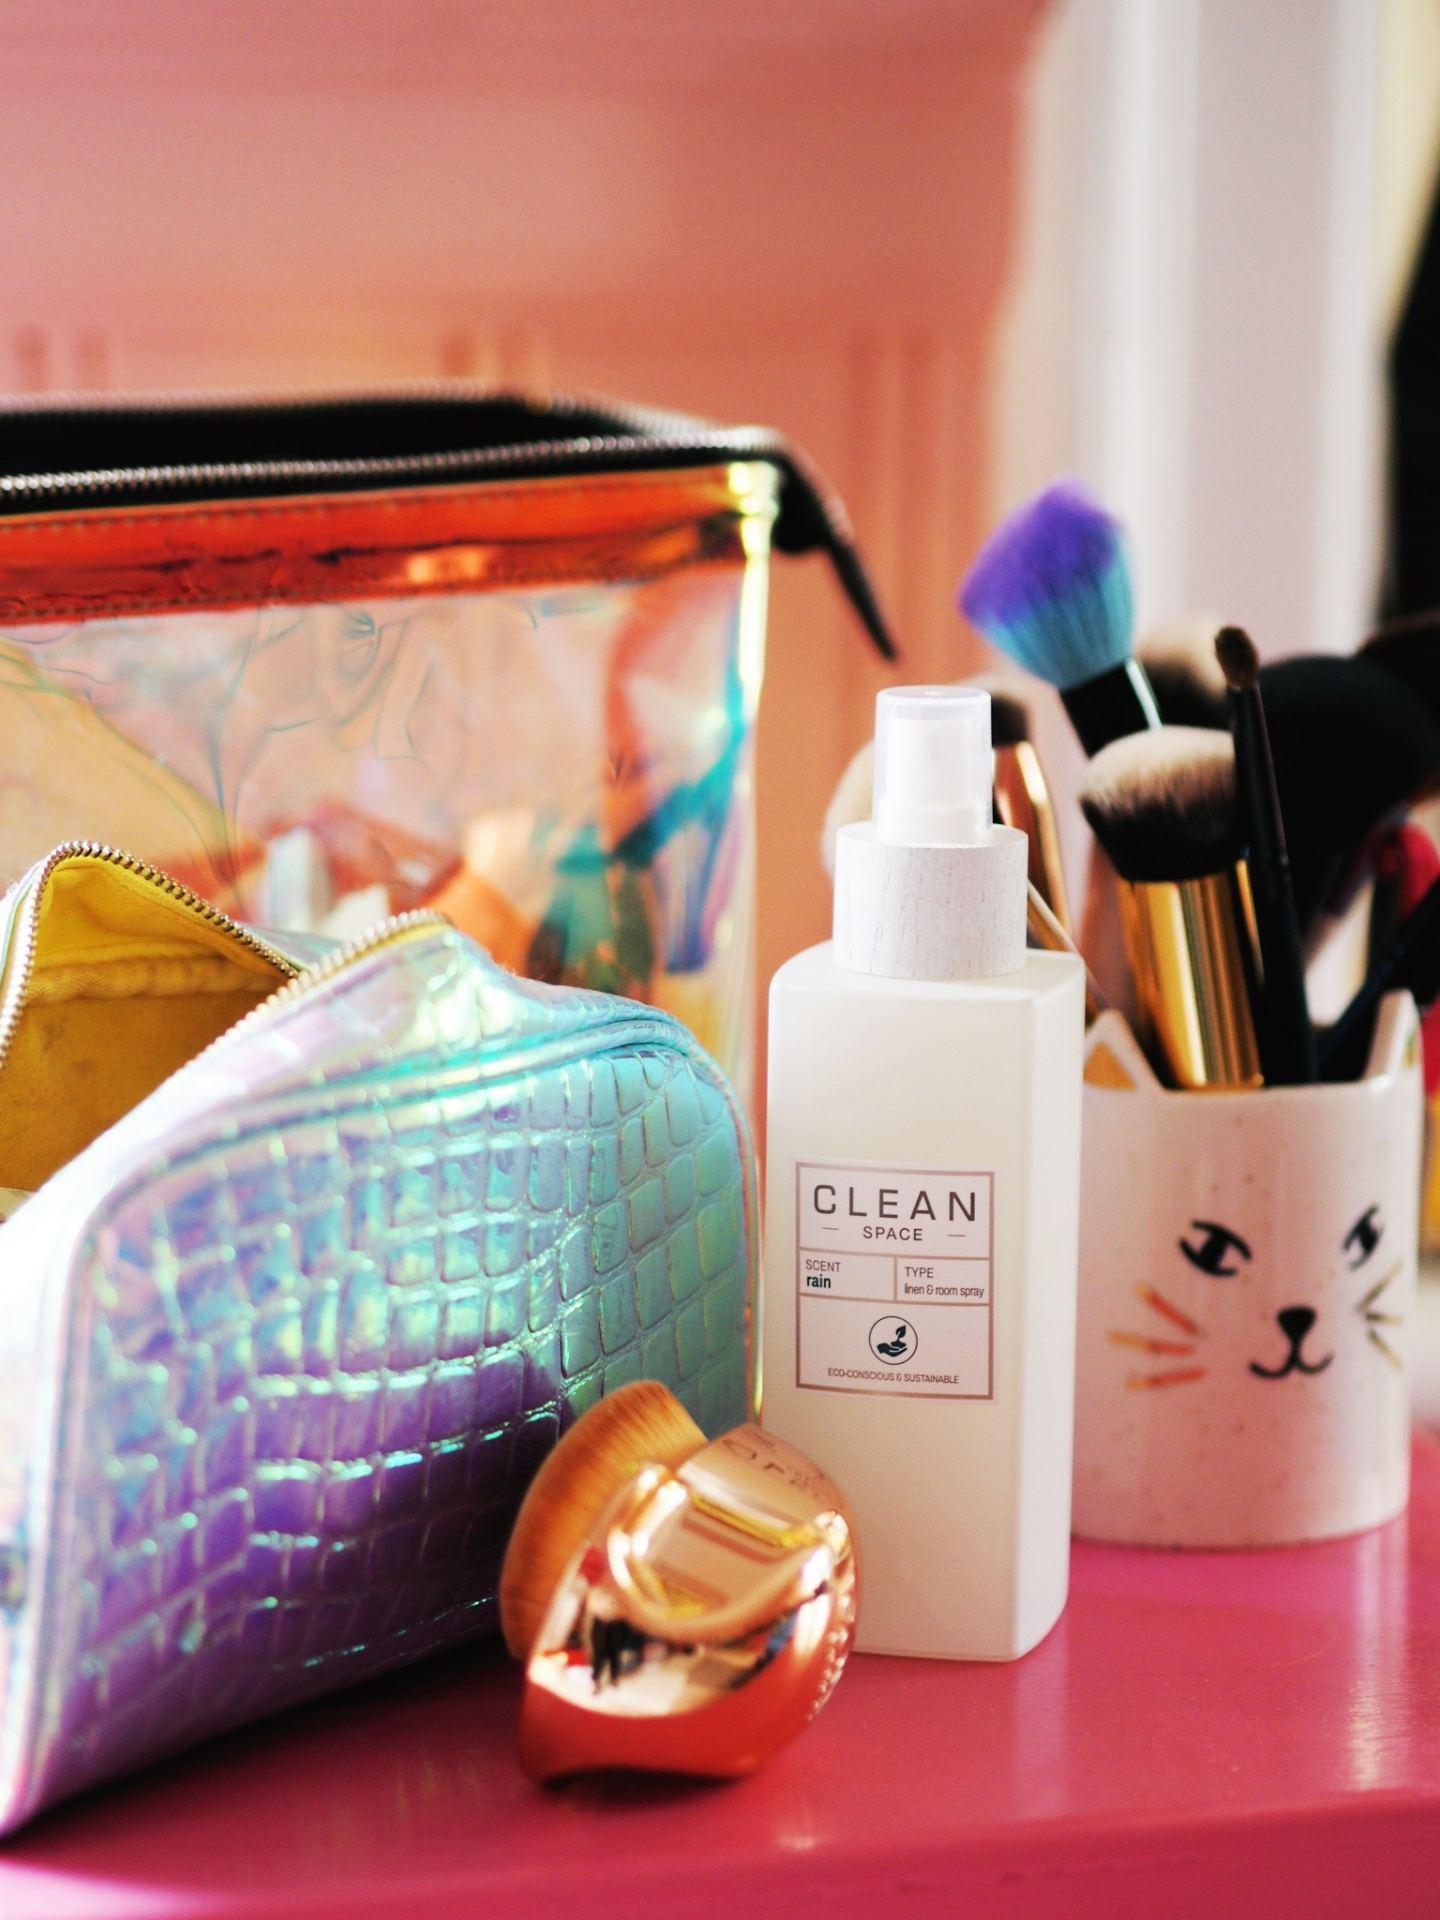 Clean Space Fragrance Mist rain perfume review